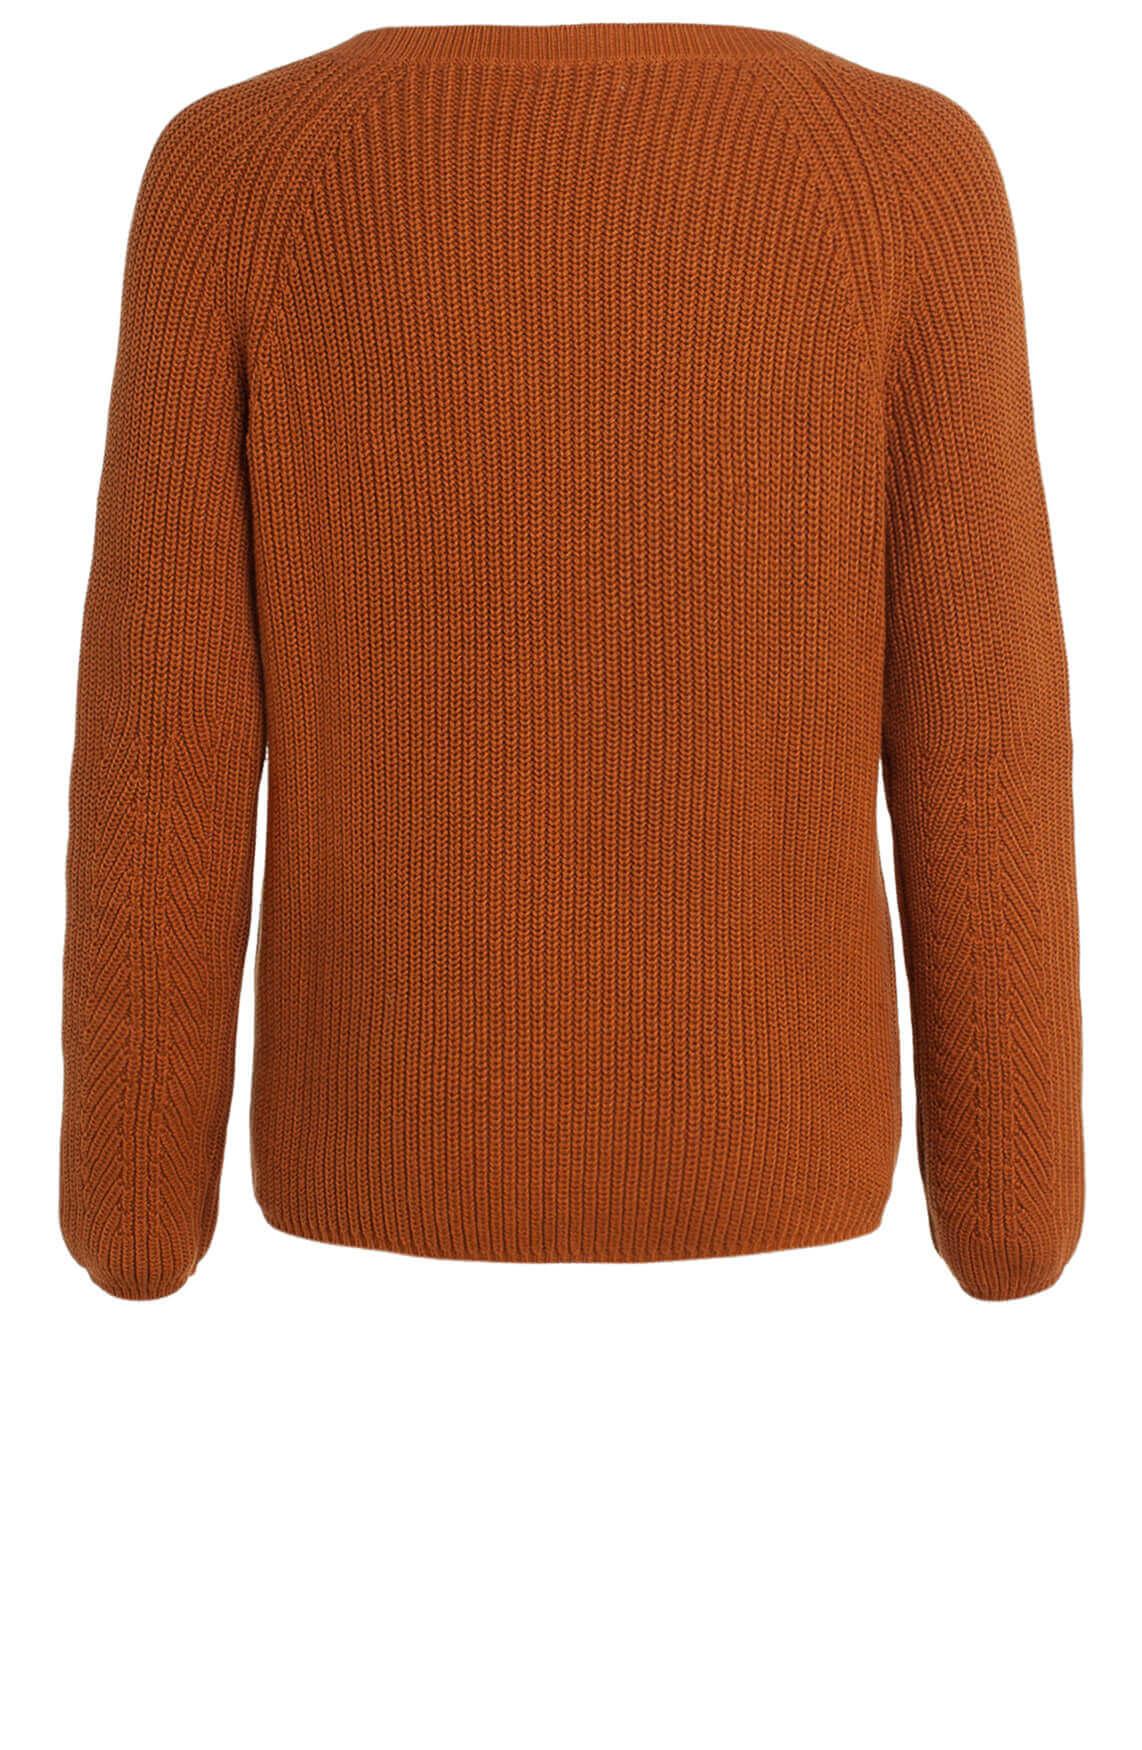 Anna Dames Gebreide pullover Bruin